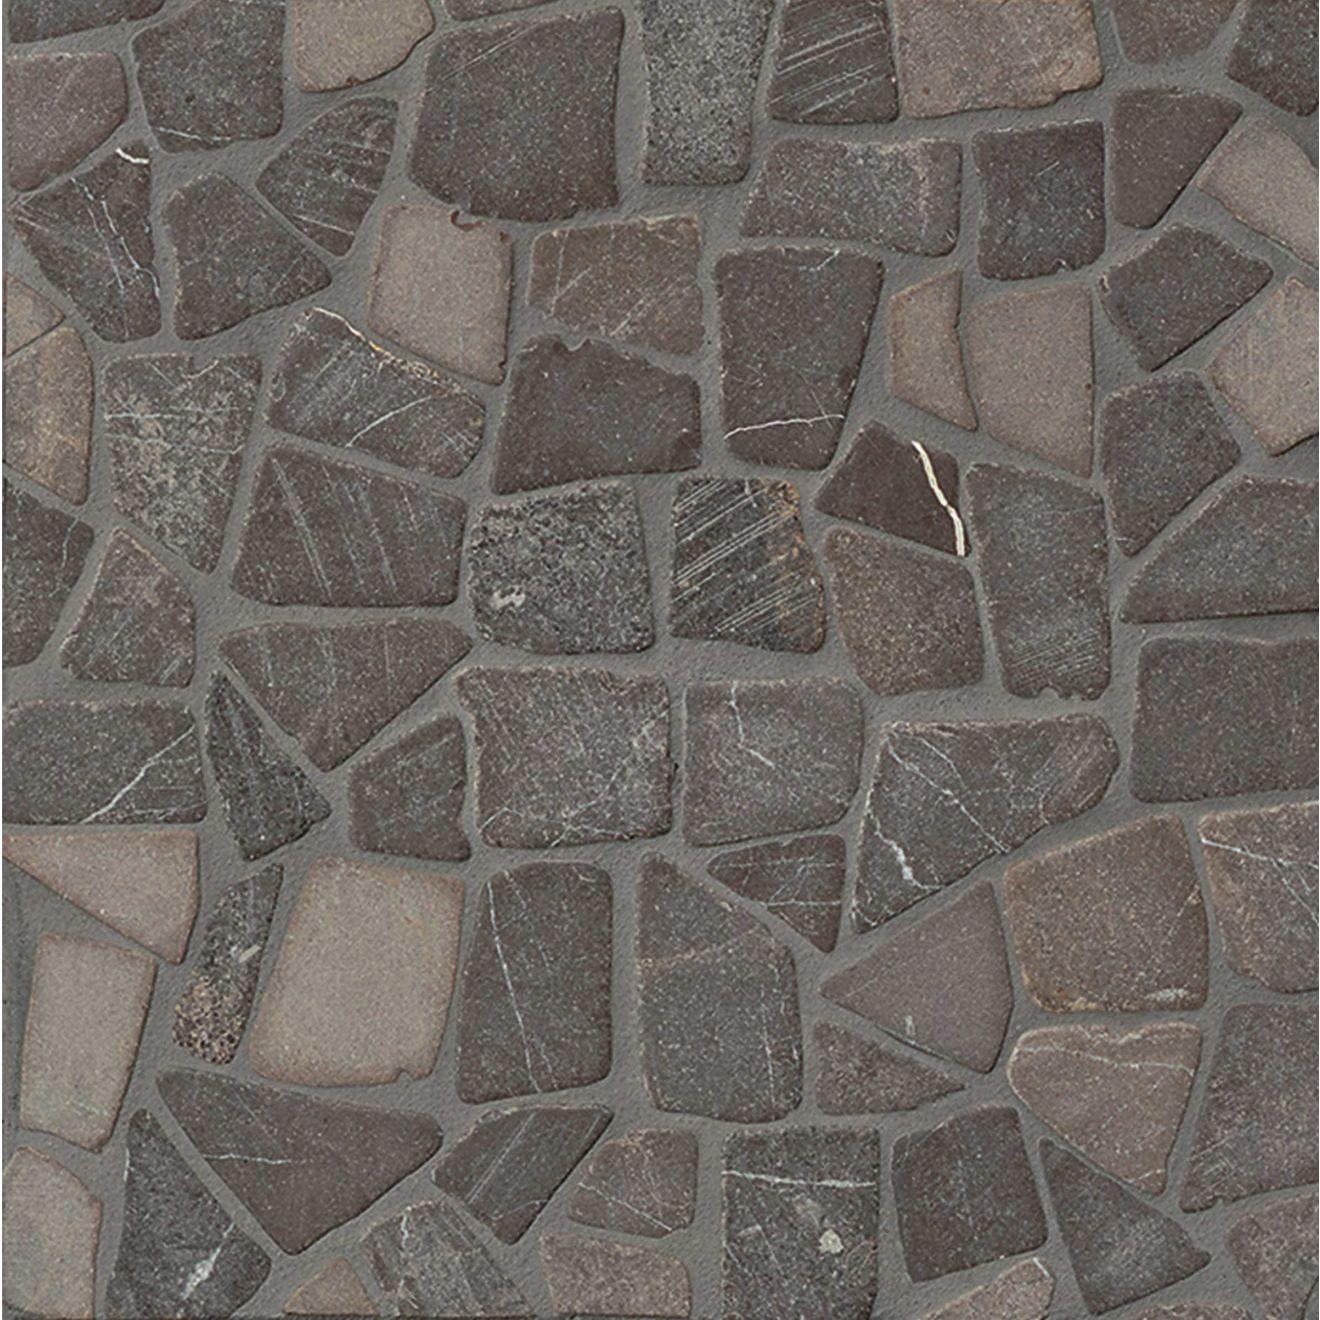 Hemisphere Floor & Wall Mosaic in Sumatra